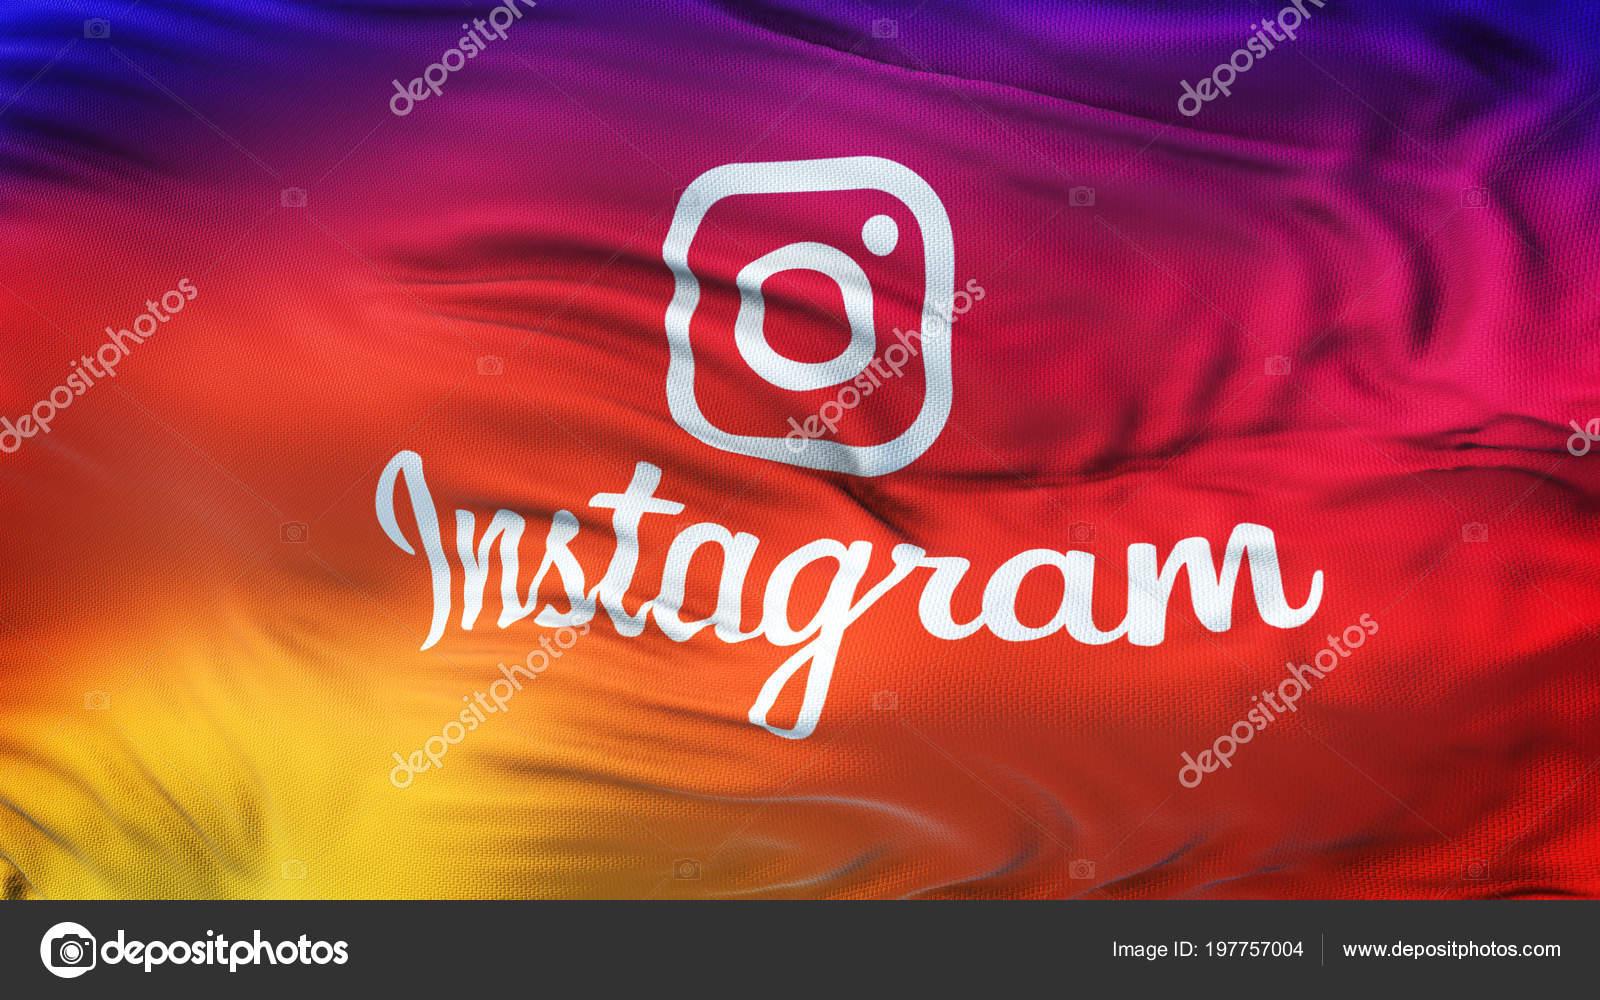 Instagram Wallpaper Hd Instagram Logo Colorful Smooth